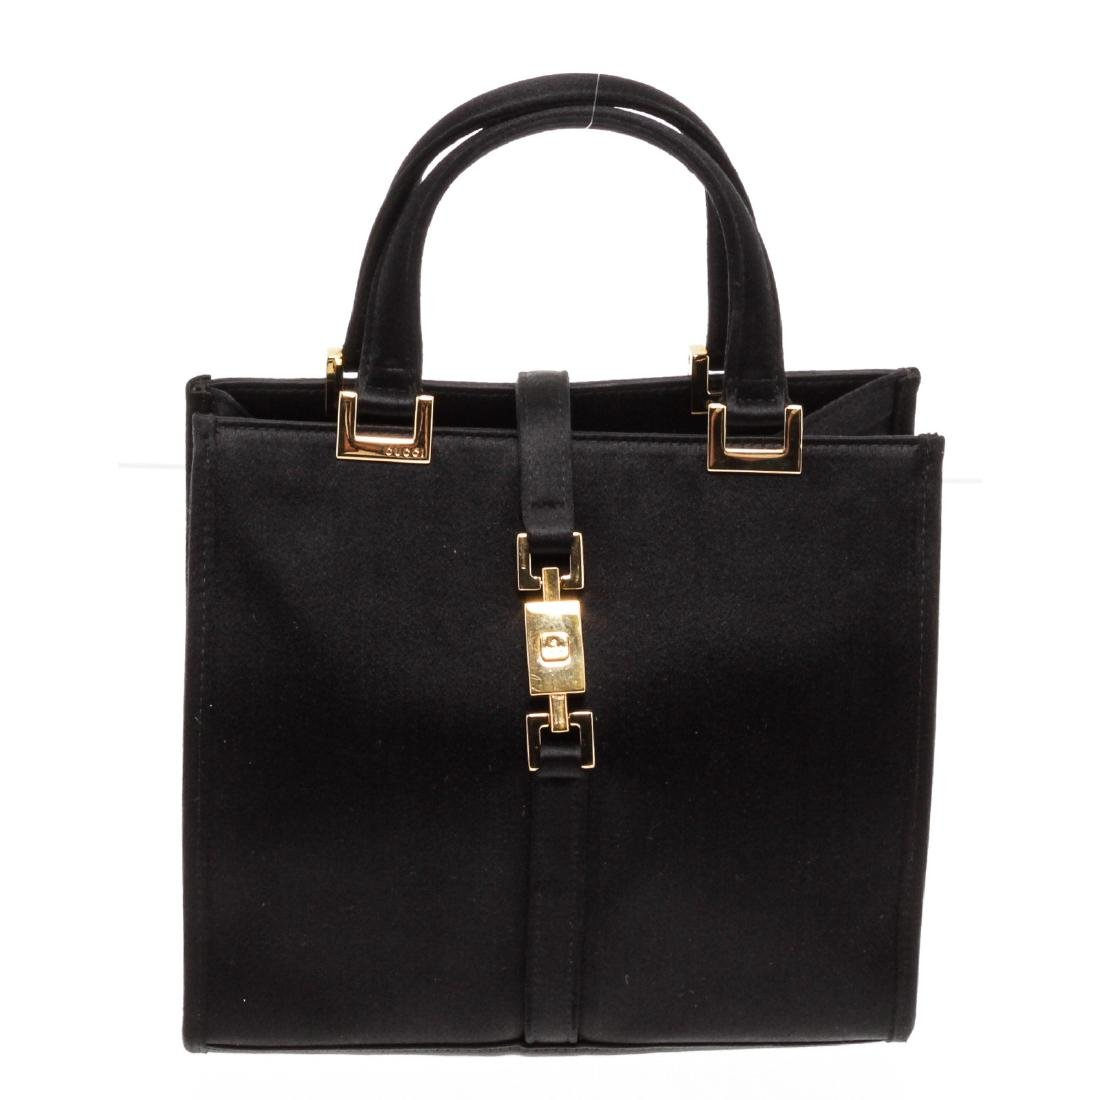 Gucci Black Satin Jackie Mini Tote Handbag